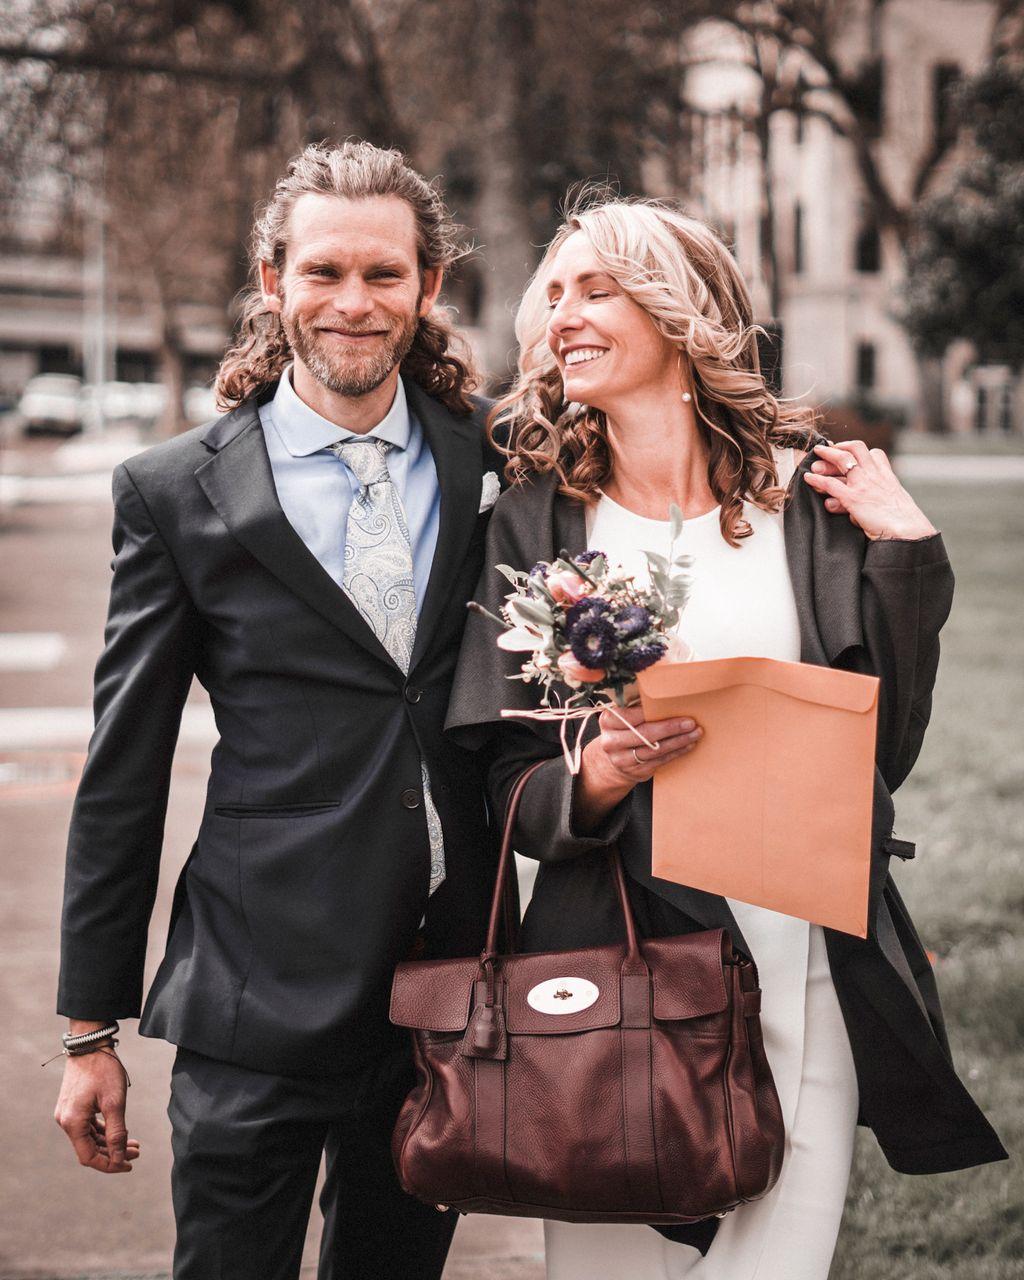 Wedding Photography - Medford 2020